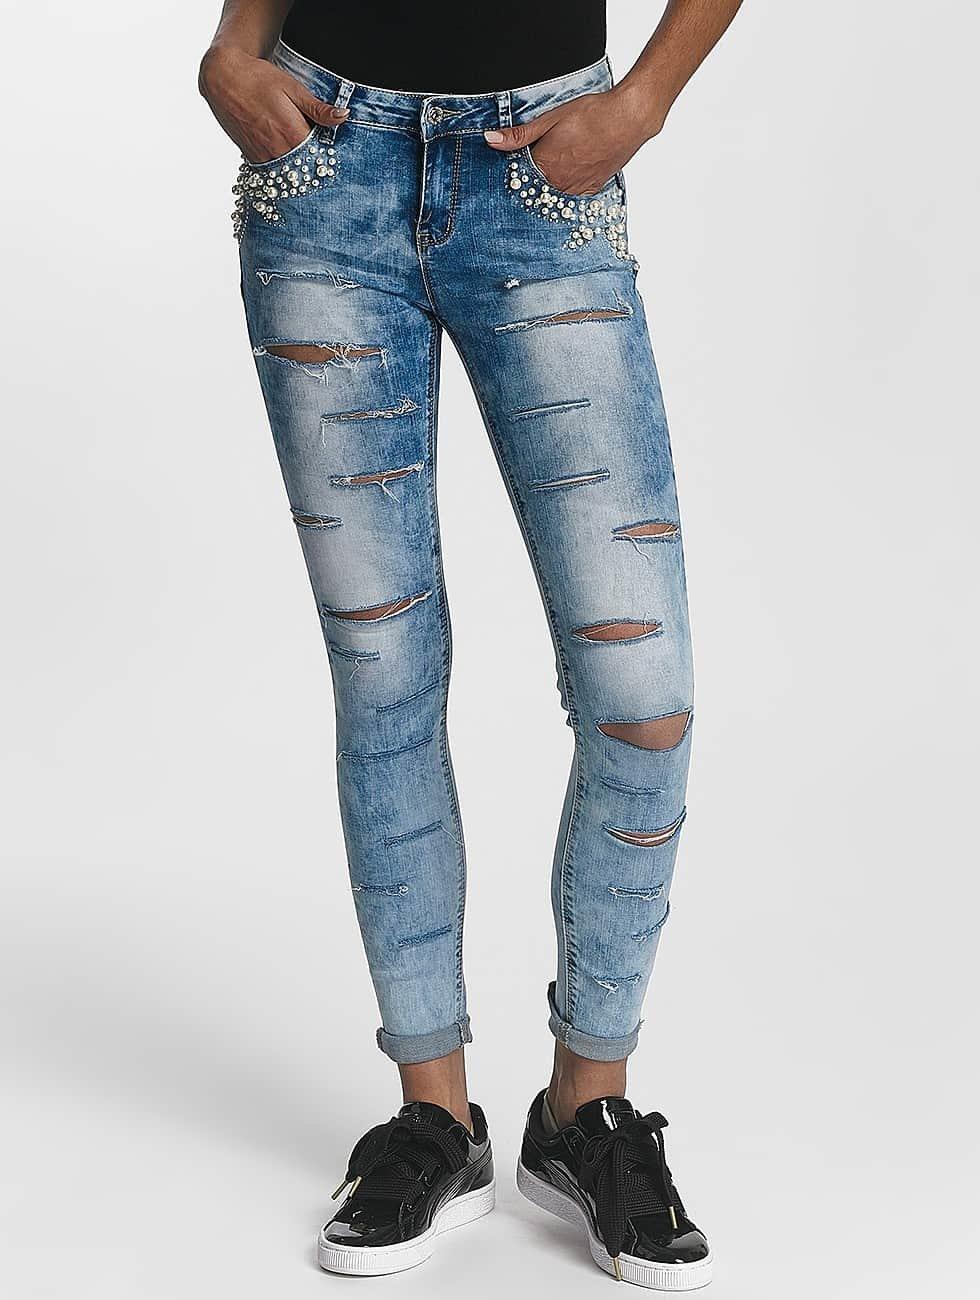 Leg Kings Облегающие джинсы Lantis 2 синий